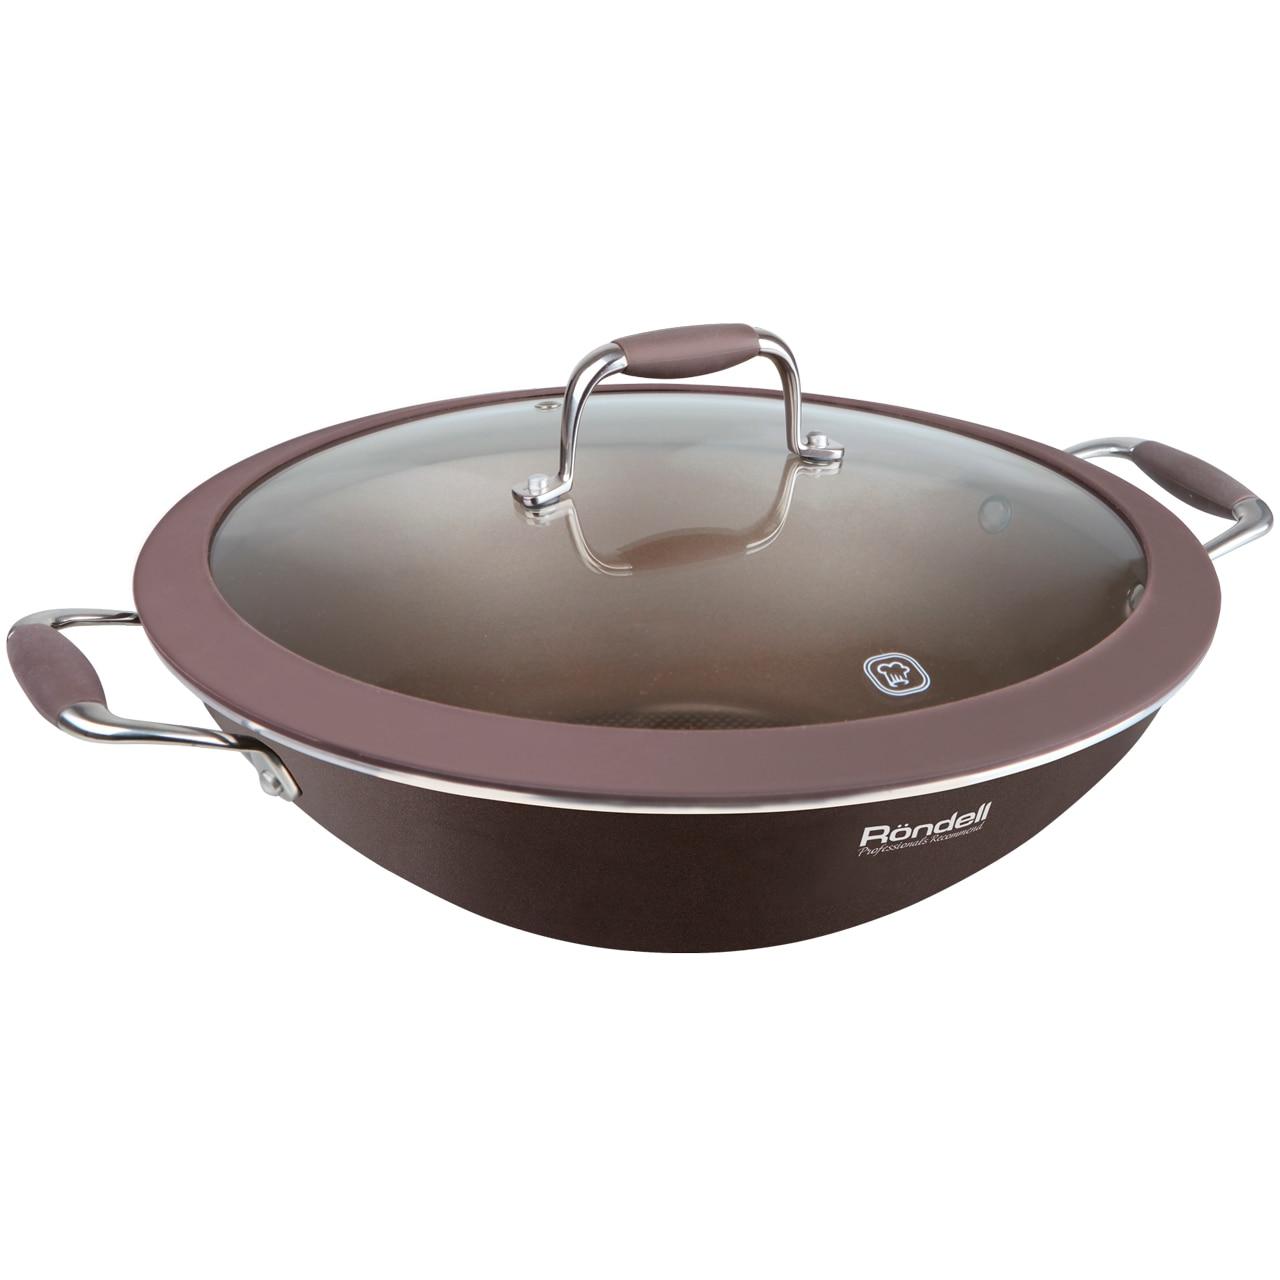 Wok with lid Rondell Mocco 4,5 L RDA-552 цена и фото